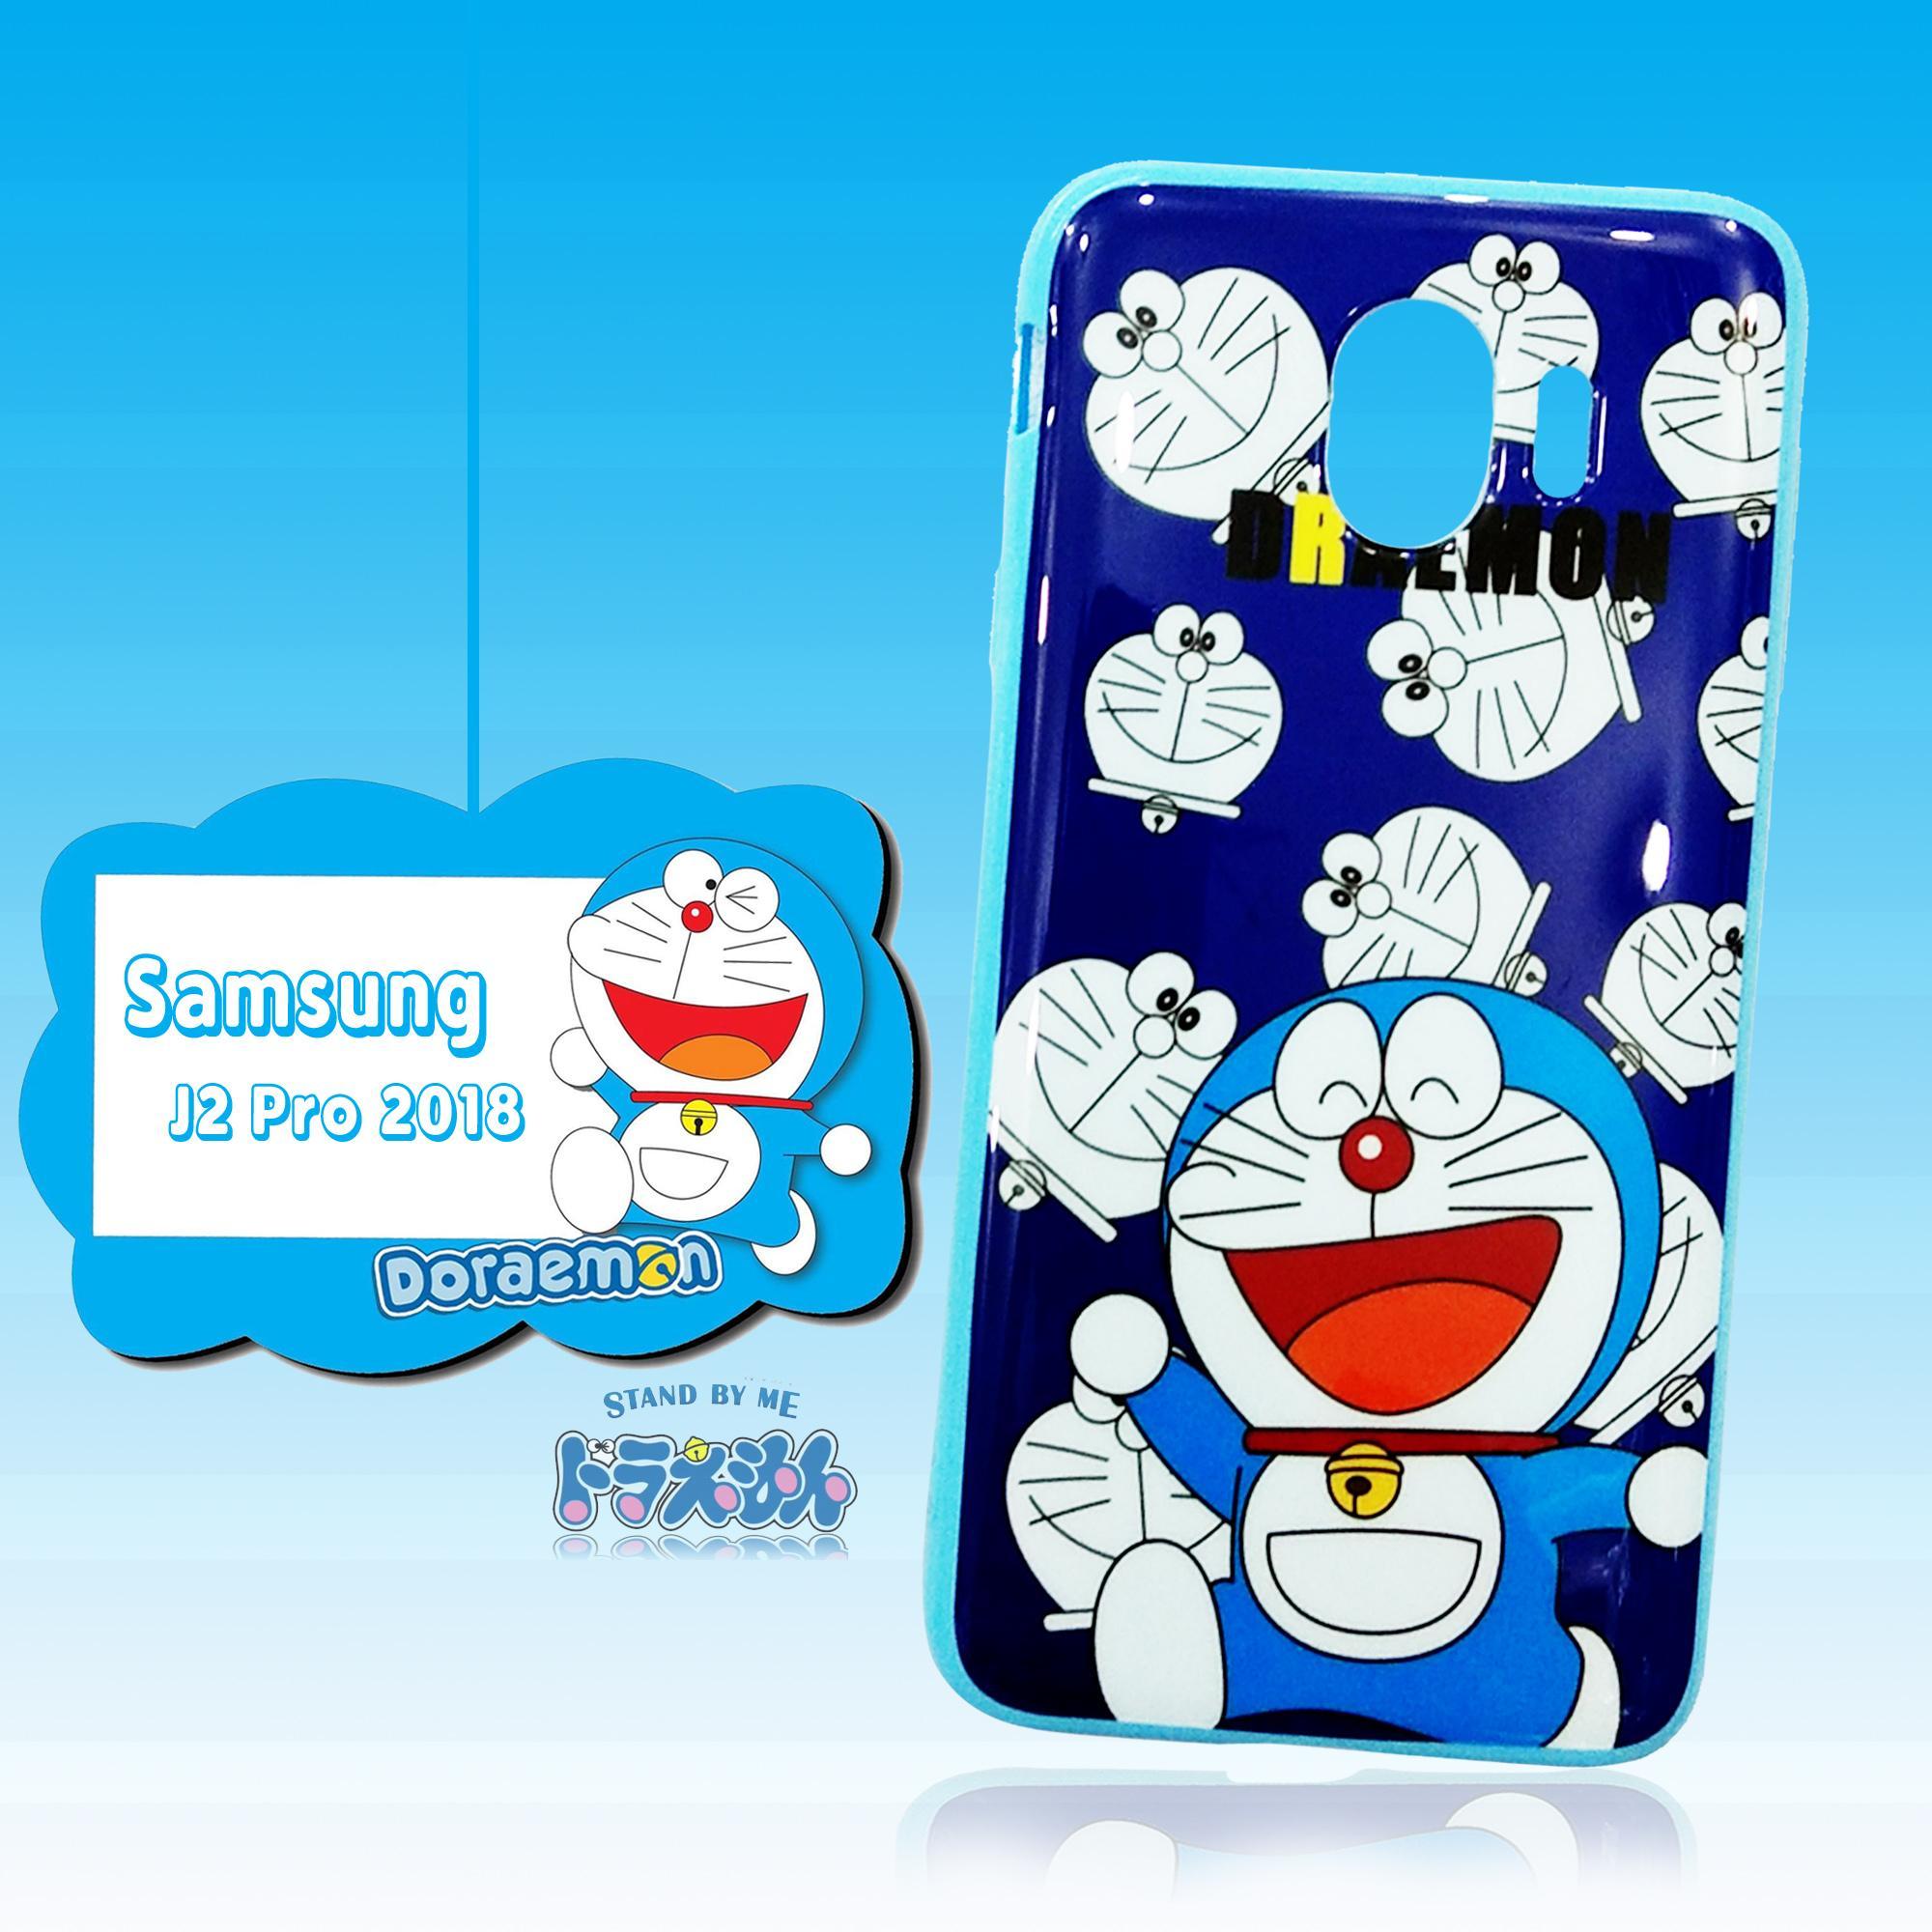 Fitur Marintri Case Samsung Galaxy J2 Pro 2018 Doraemon Manja Dan